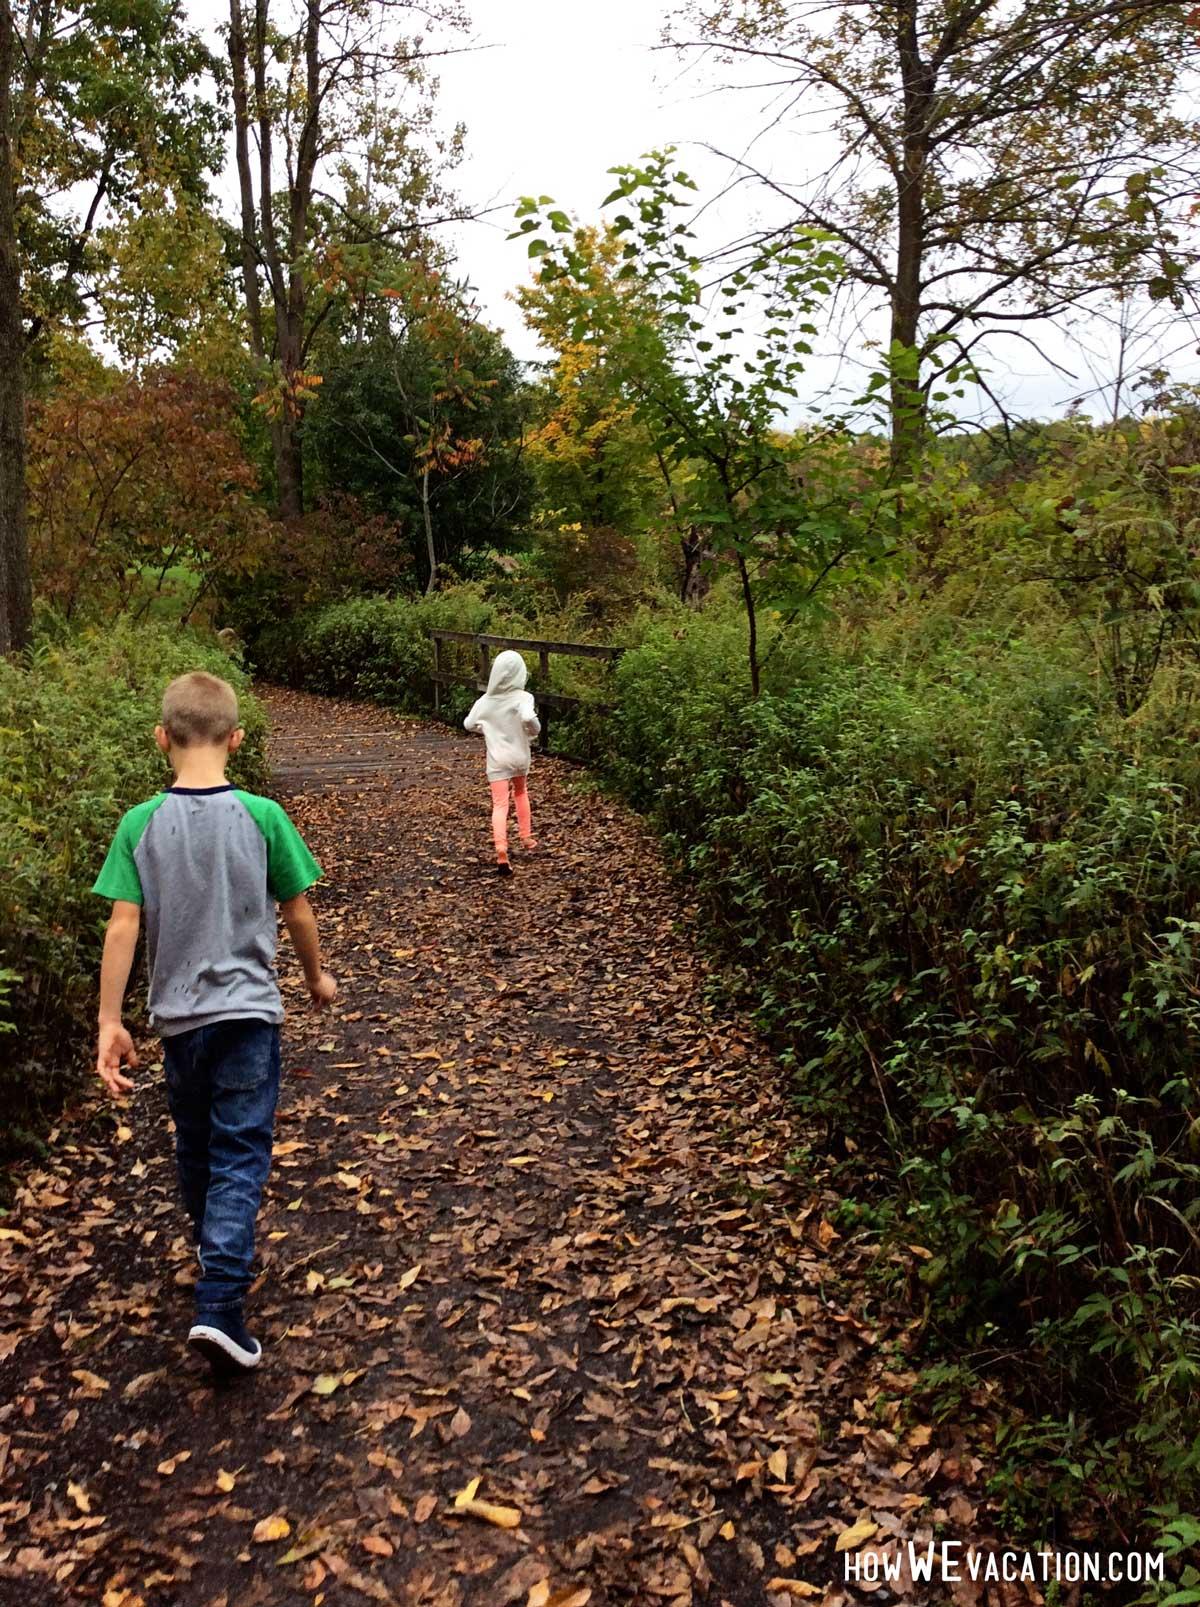 Walking through the Sacred Grove